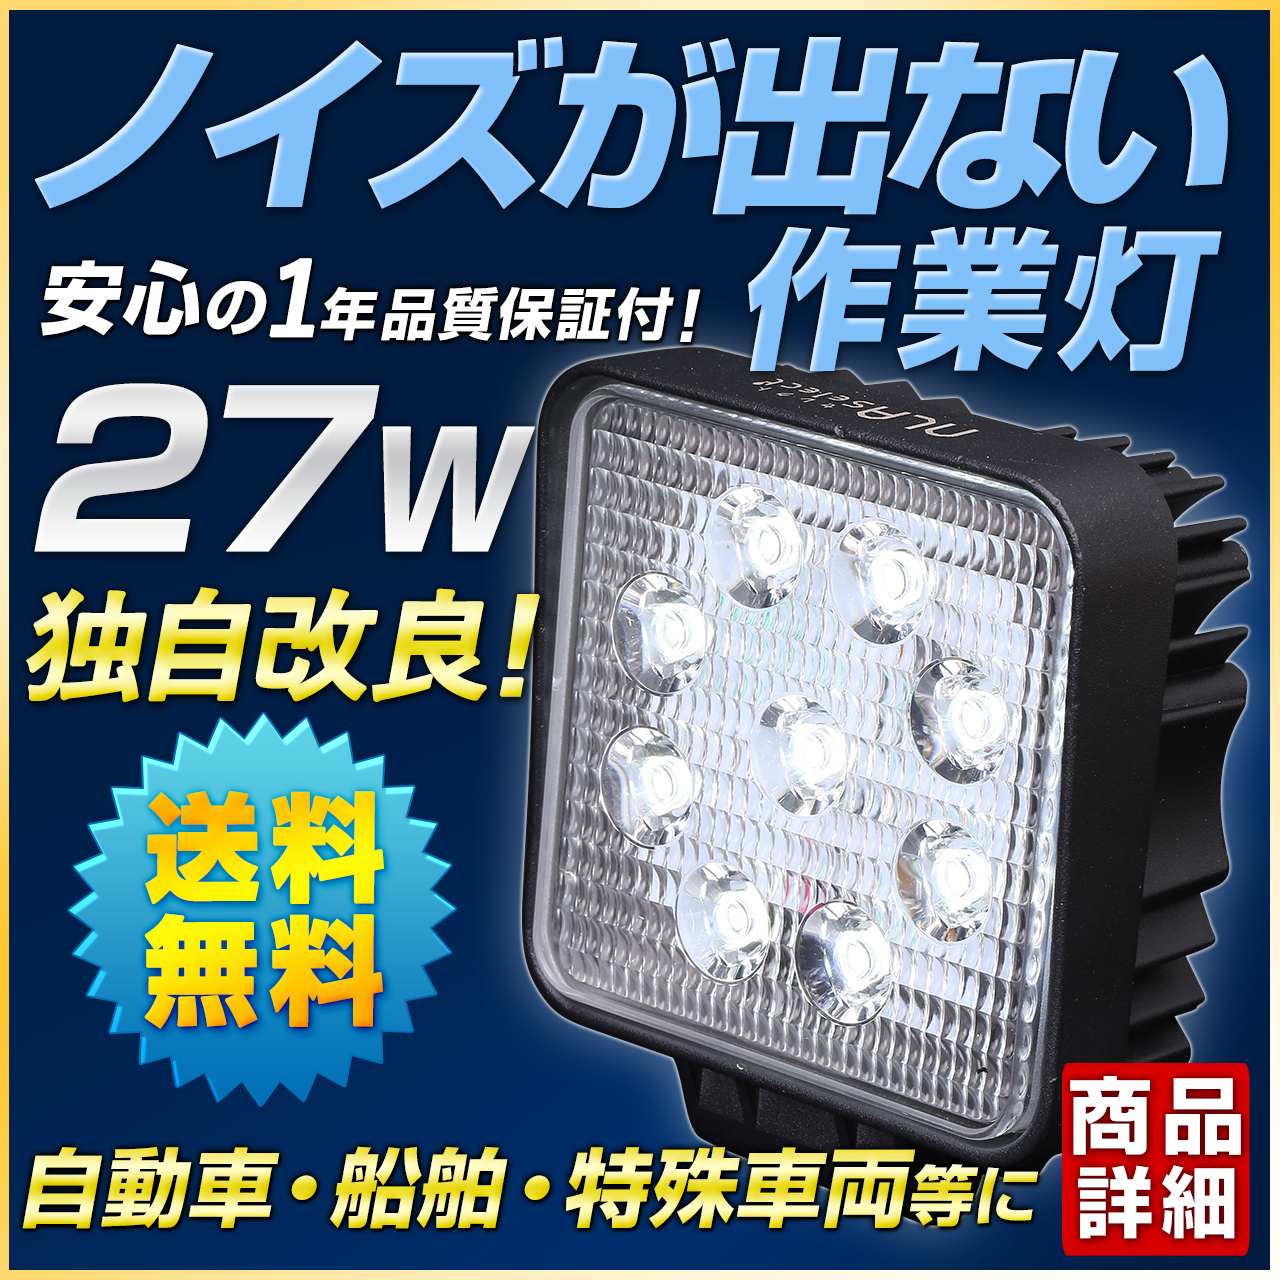 27Wノイズレス作業灯